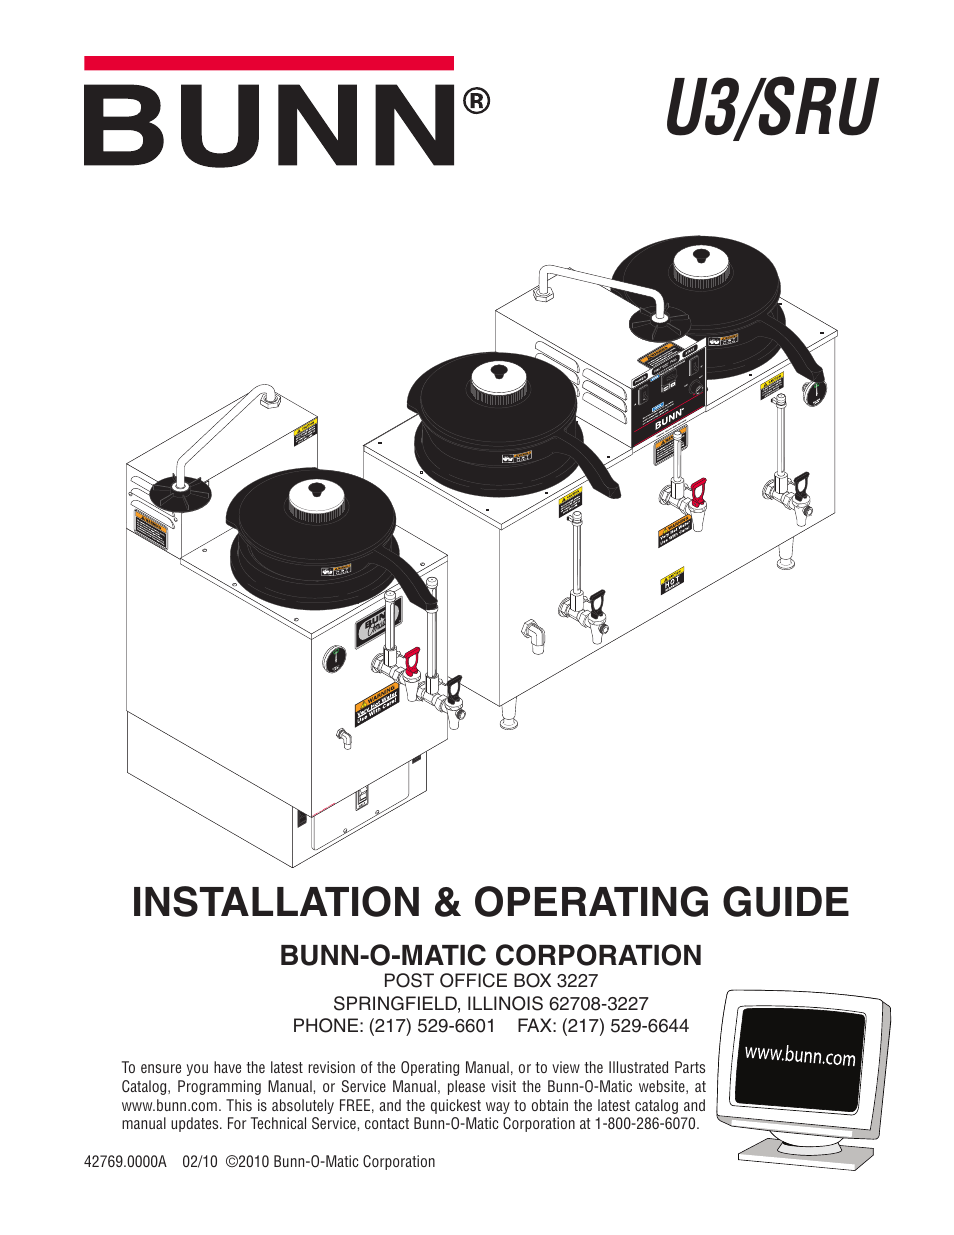 hight resolution of bunn u3 sru user manual 9 pagesbunn model bx wiring diagram 16